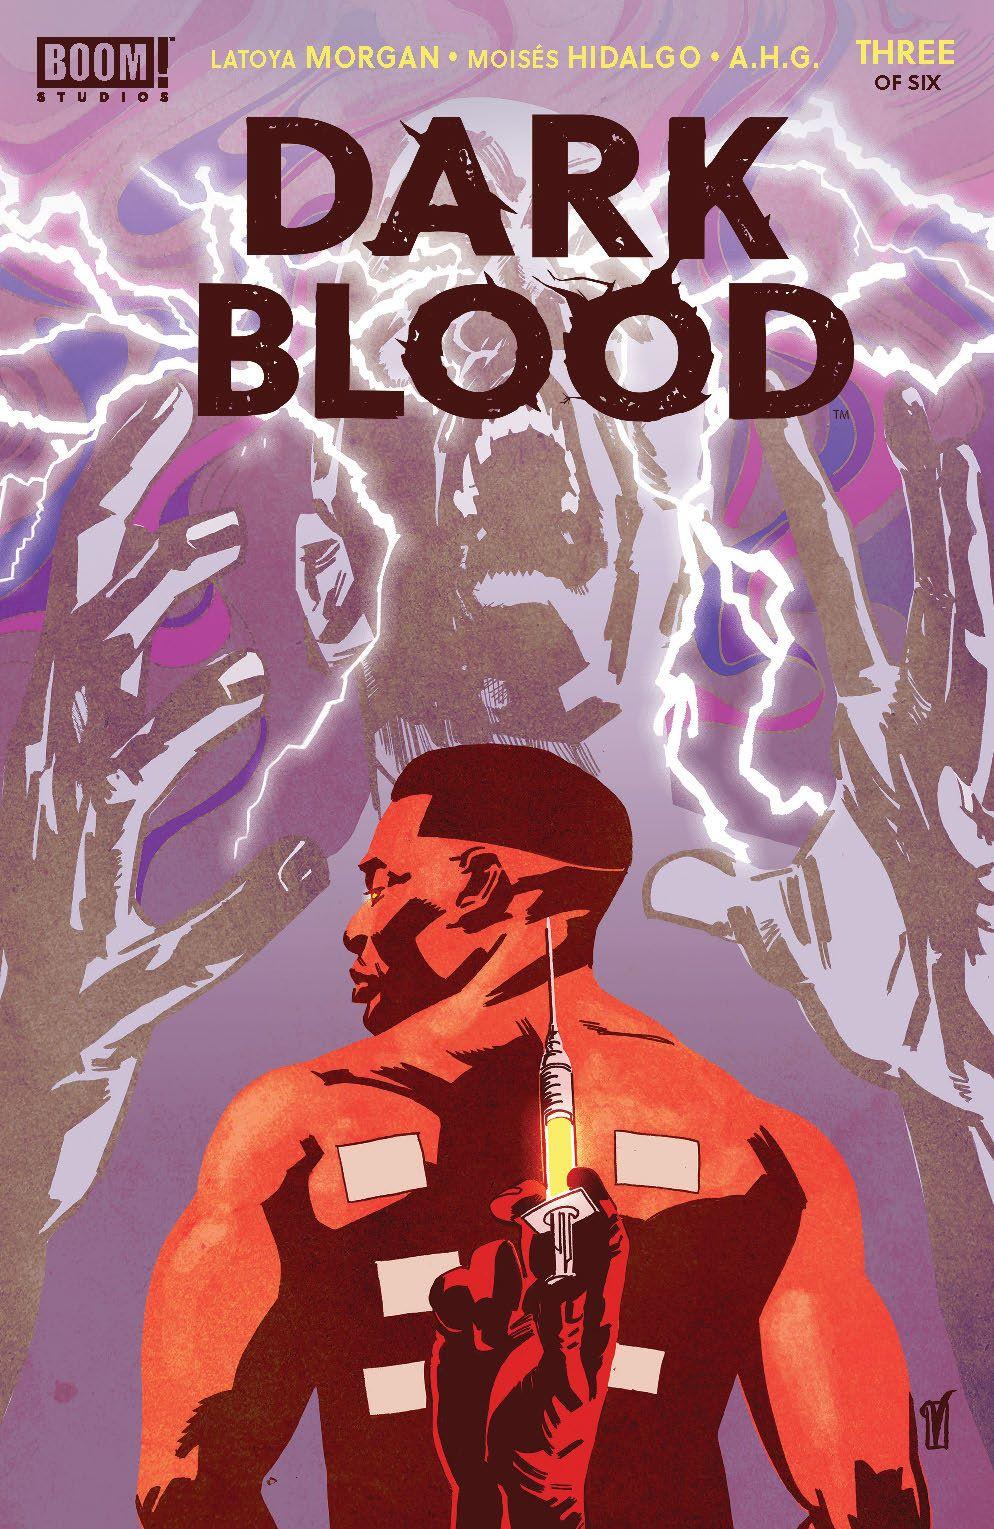 DarkBlood_003_Cover_A_Main ComicList Previews: DARK BLOOD #3 (OF 6)